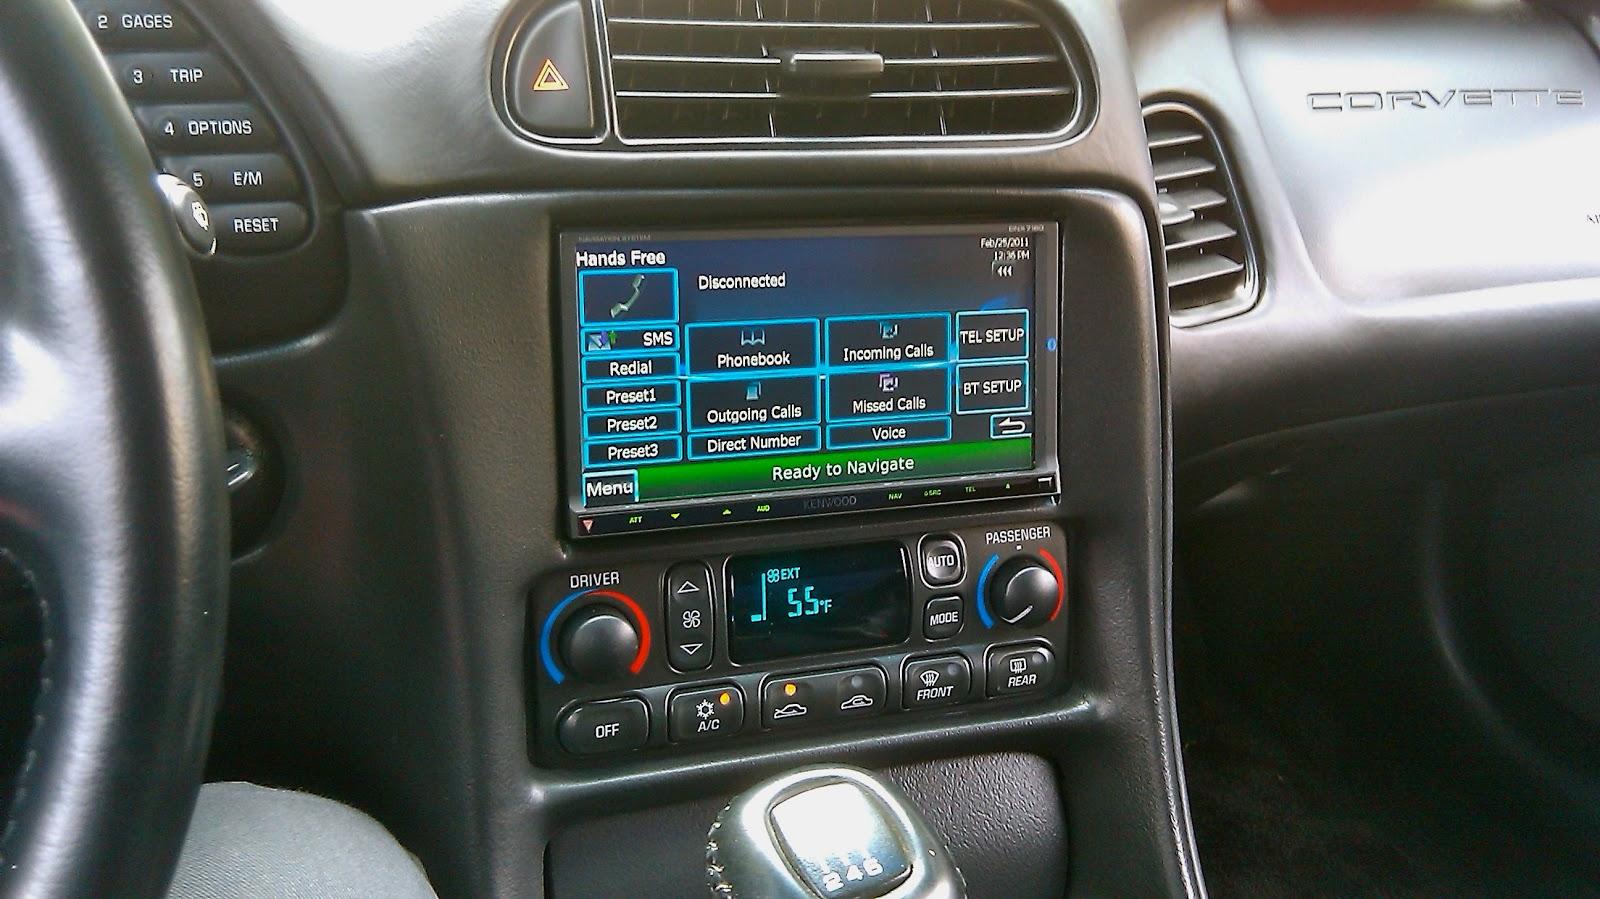 Honda accord double din radio topsimages